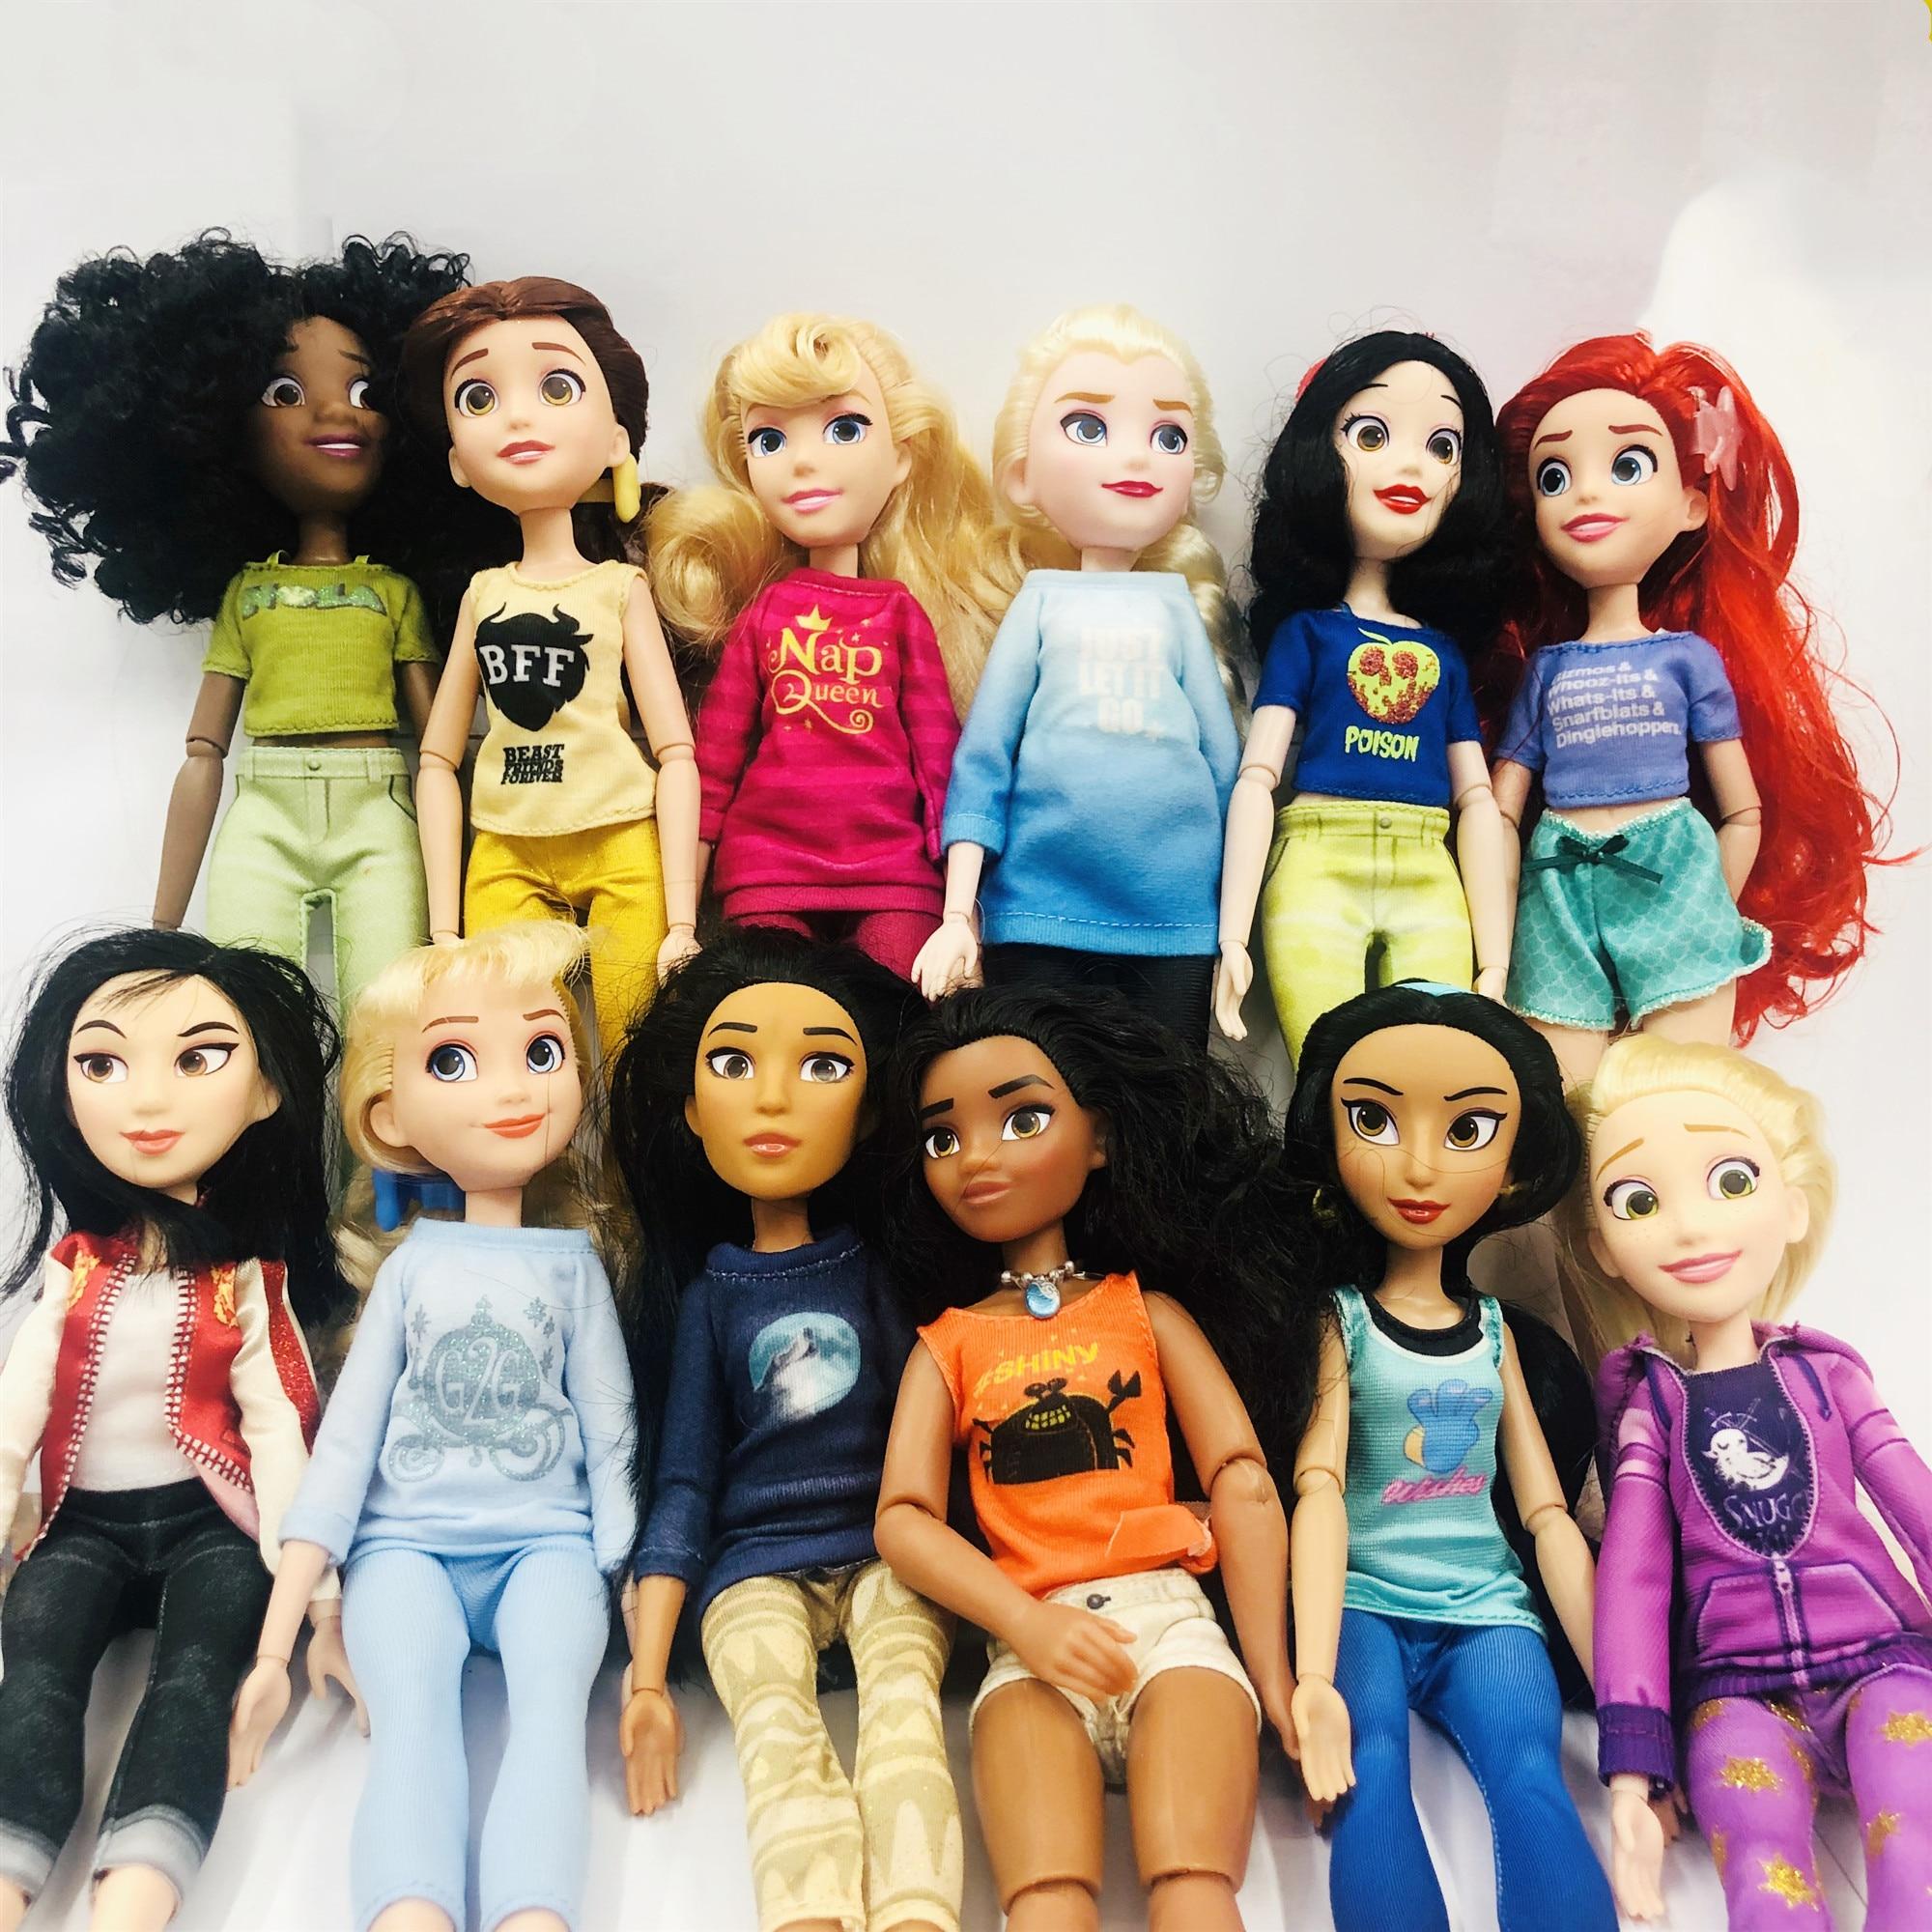 New Rapunzel Princess Jasmine Princess Of Casual Wear Doll Snow White Ariel Merida Cinderella Aurora Belle Dolls For Girls Toy